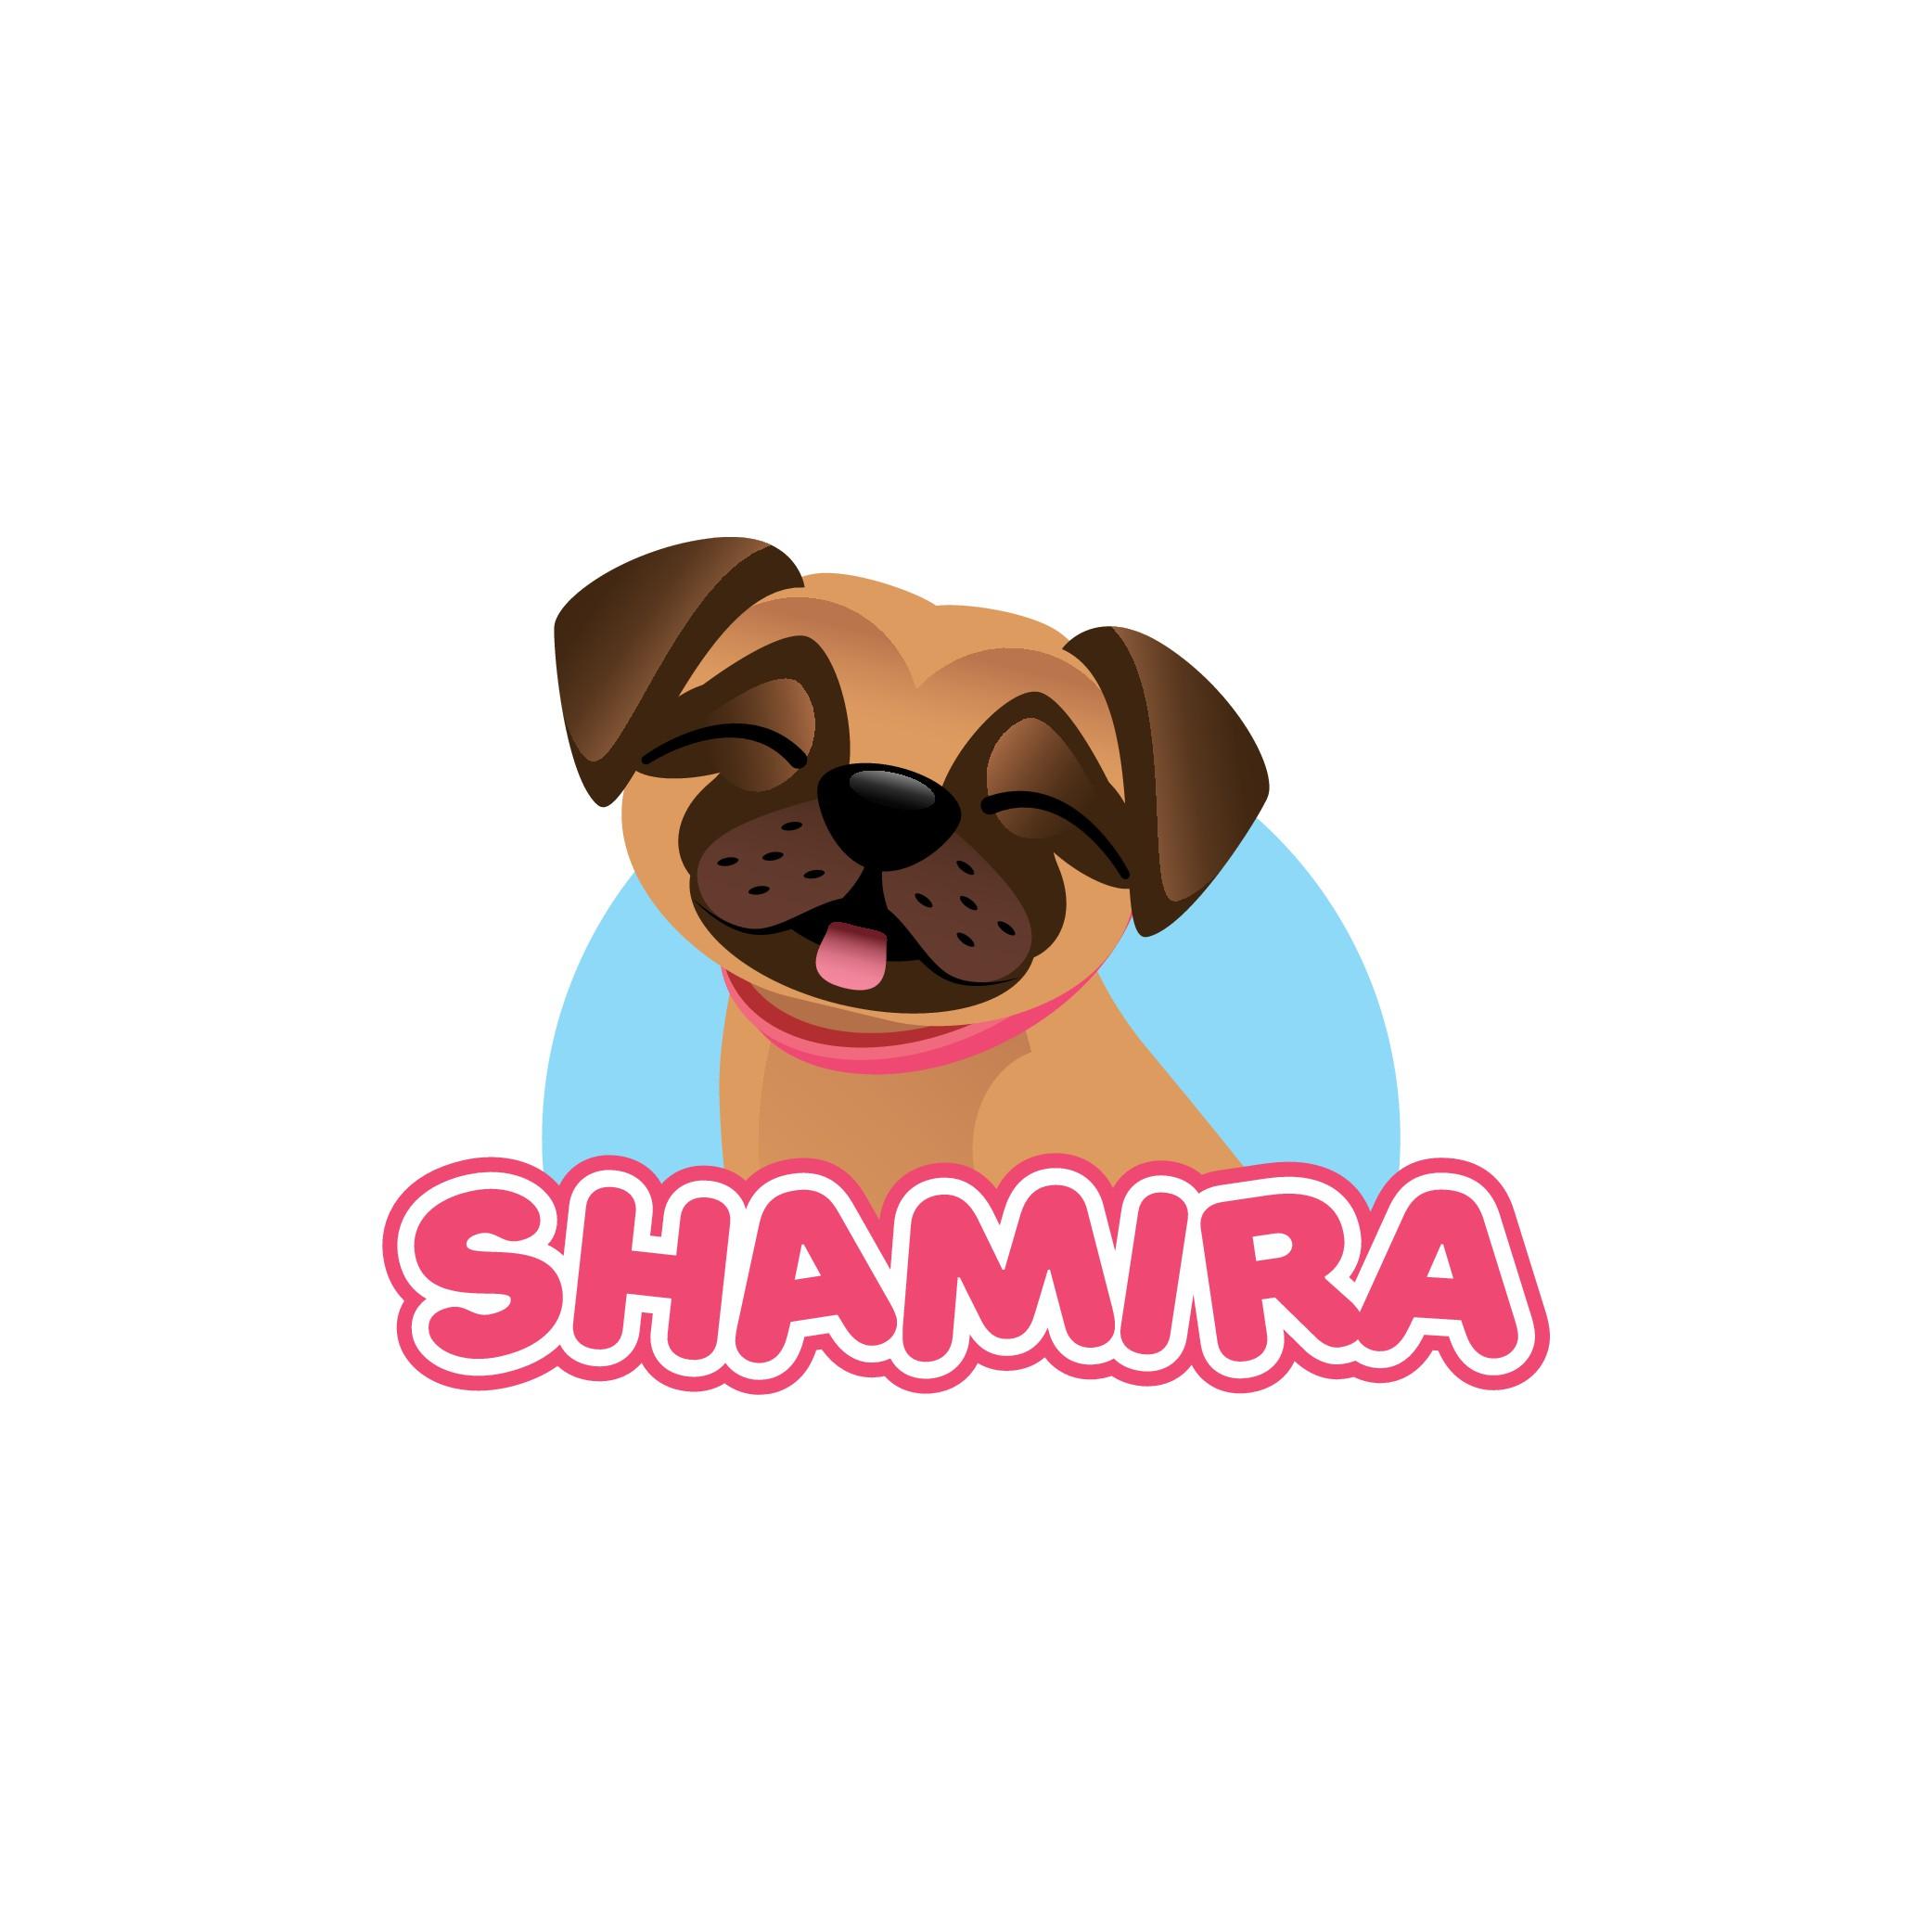 Simple/Fun/Cute Dog Logo Needed!